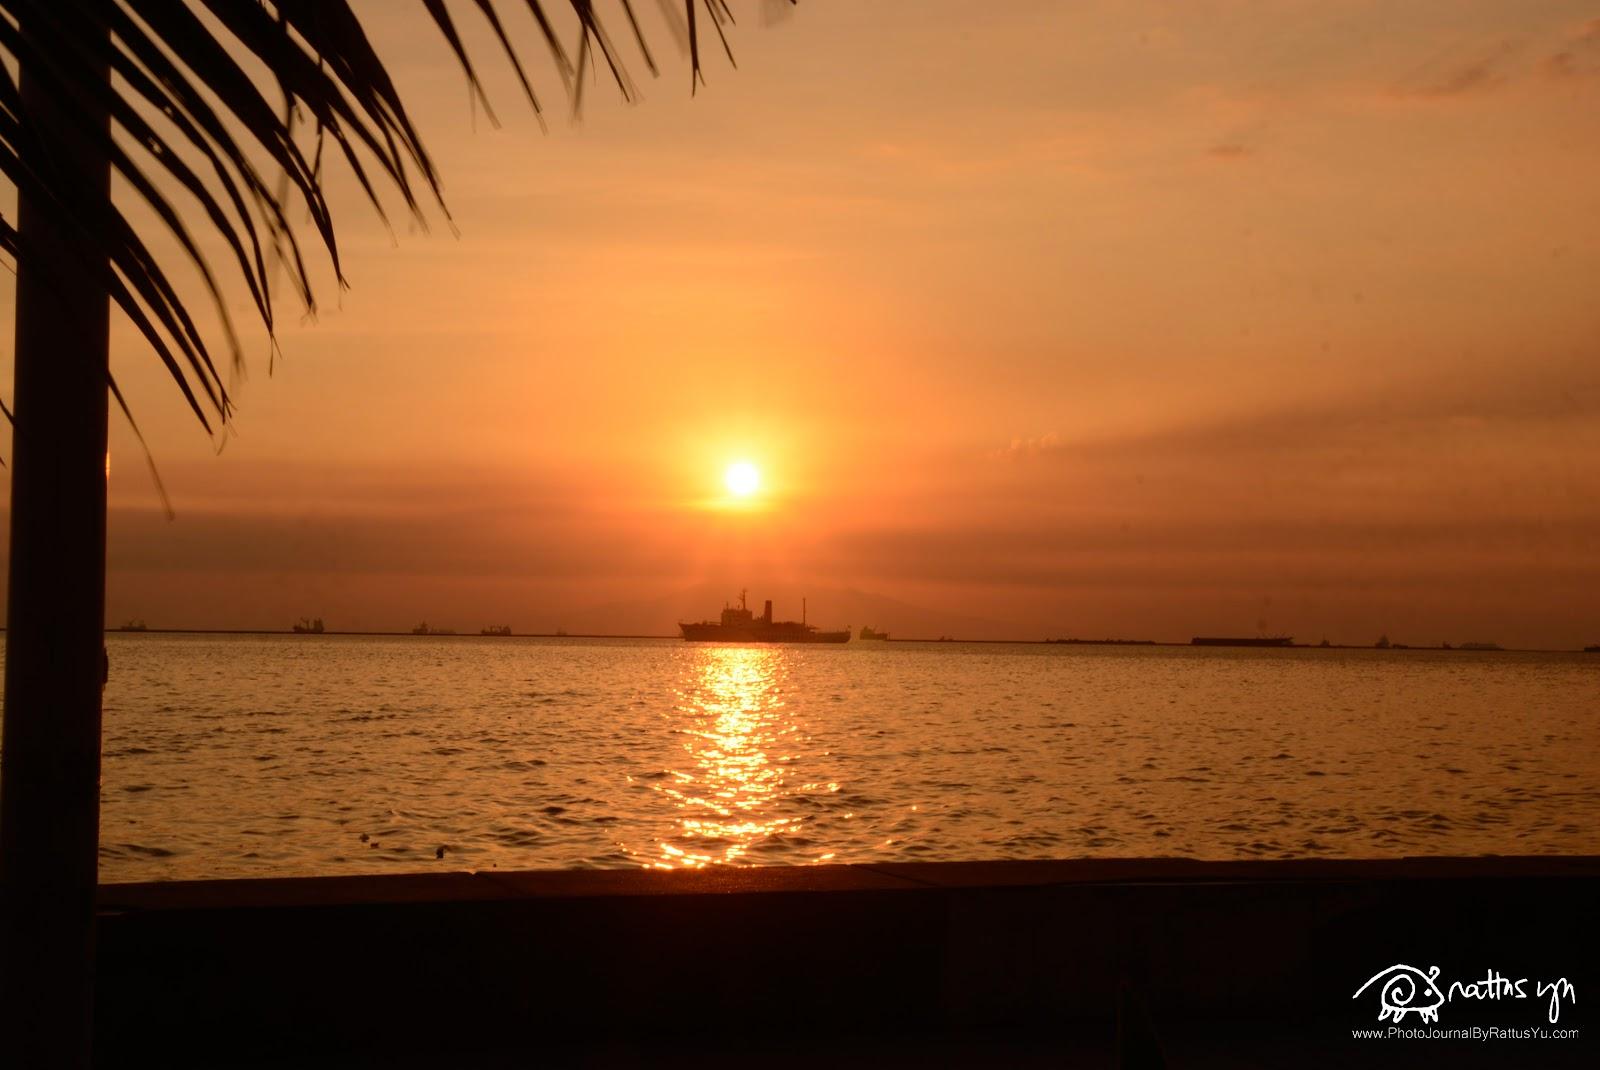 Sunset in Manila Bay, Sigma DC 18-200mm f/3.5-6.3 OS HSM